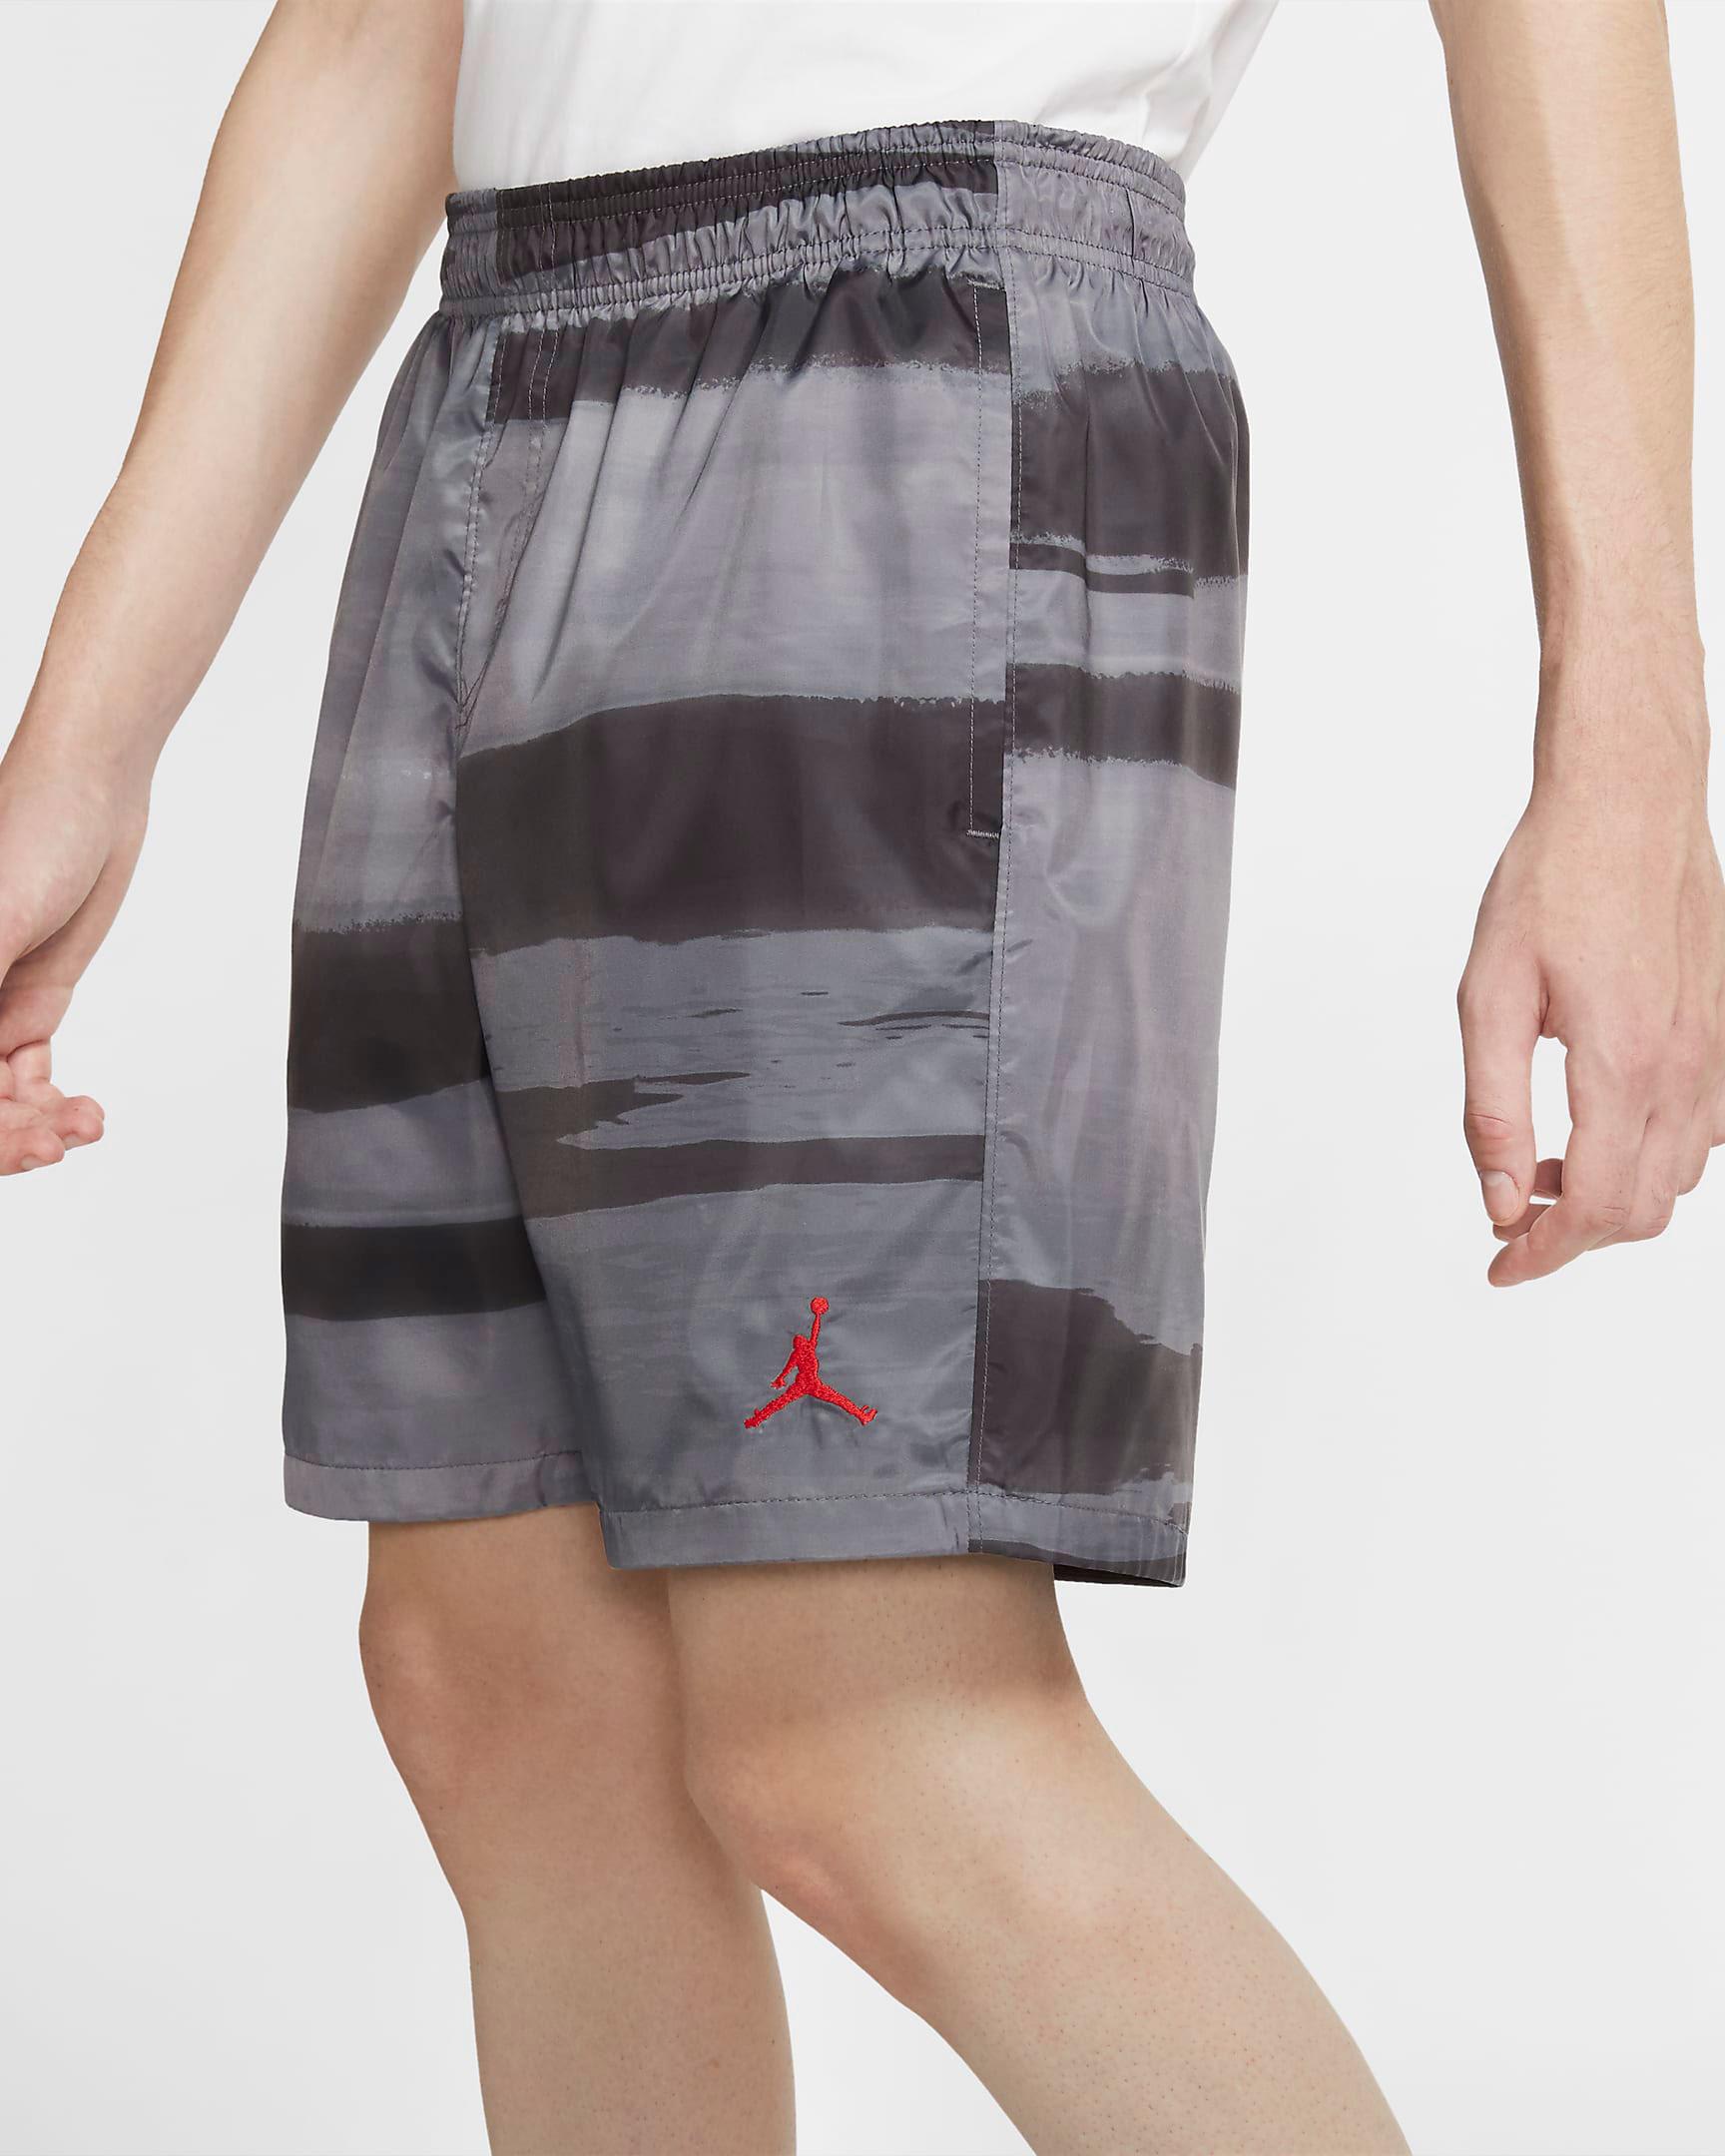 air-jordan-11-low-ie-black-cement-shorts-to-match-1